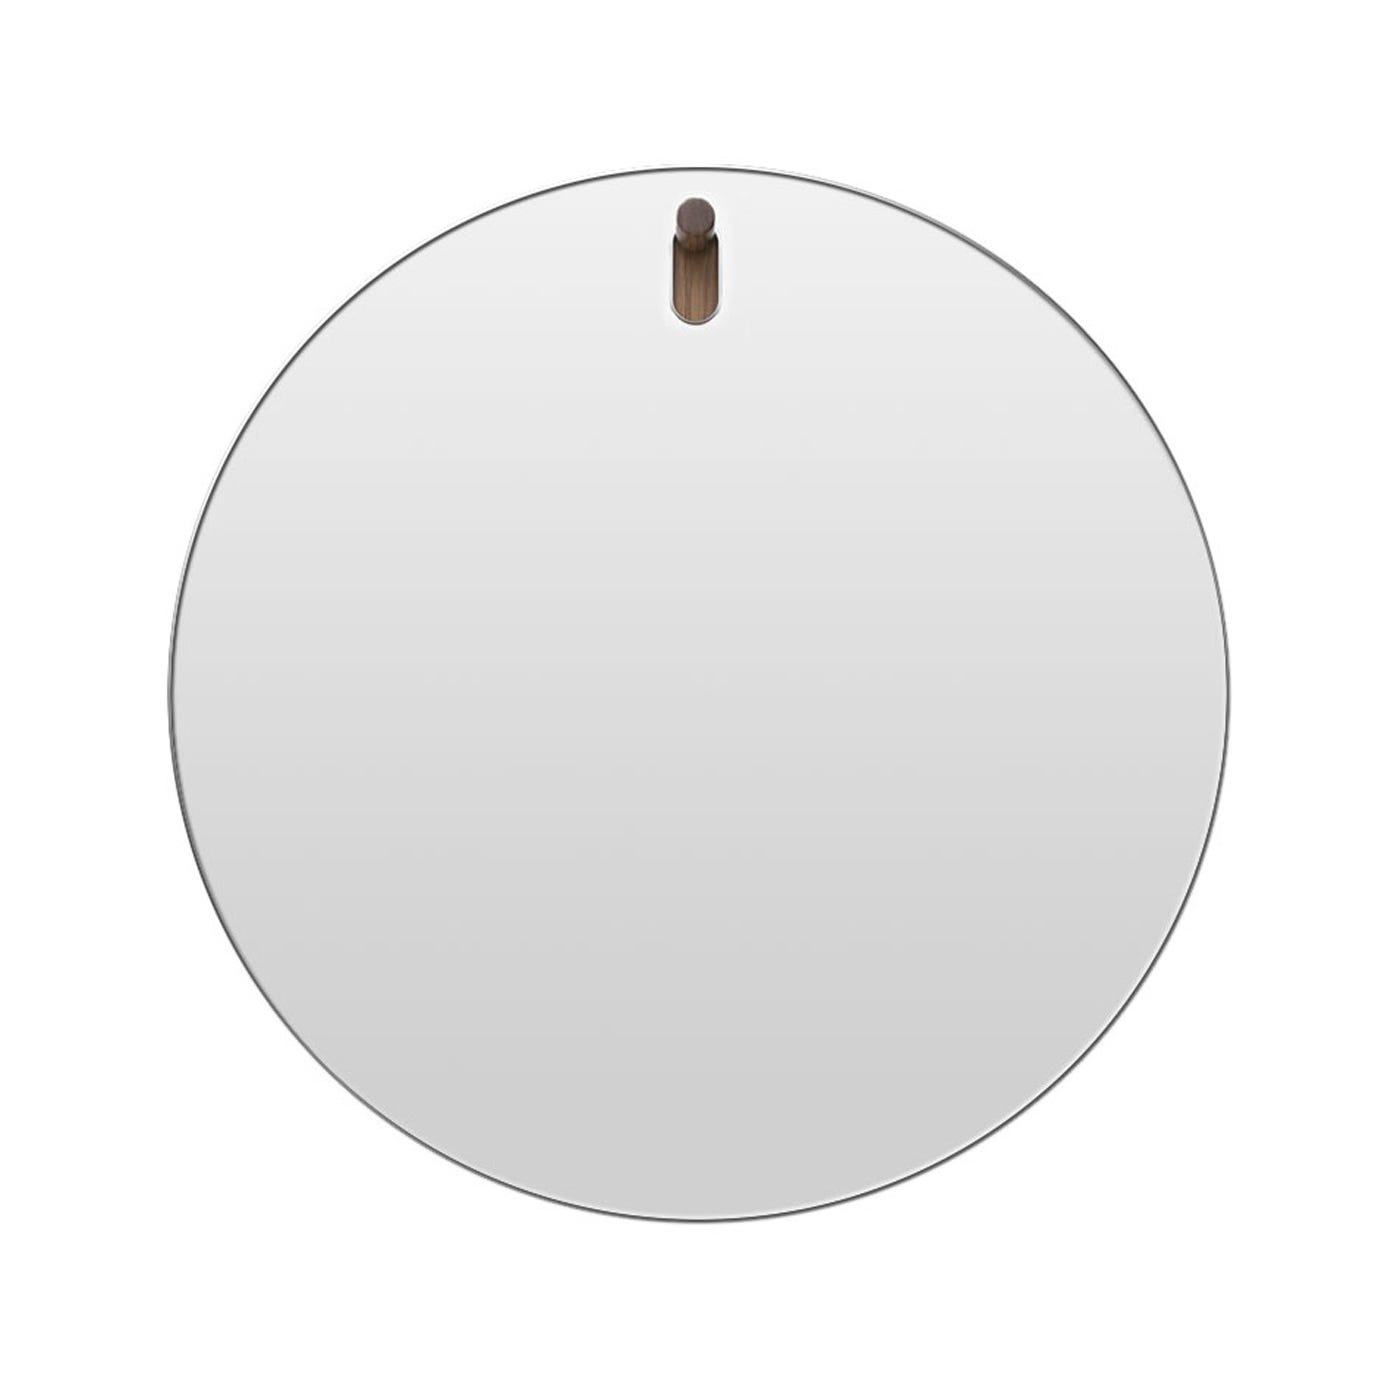 Hang Round Mirror